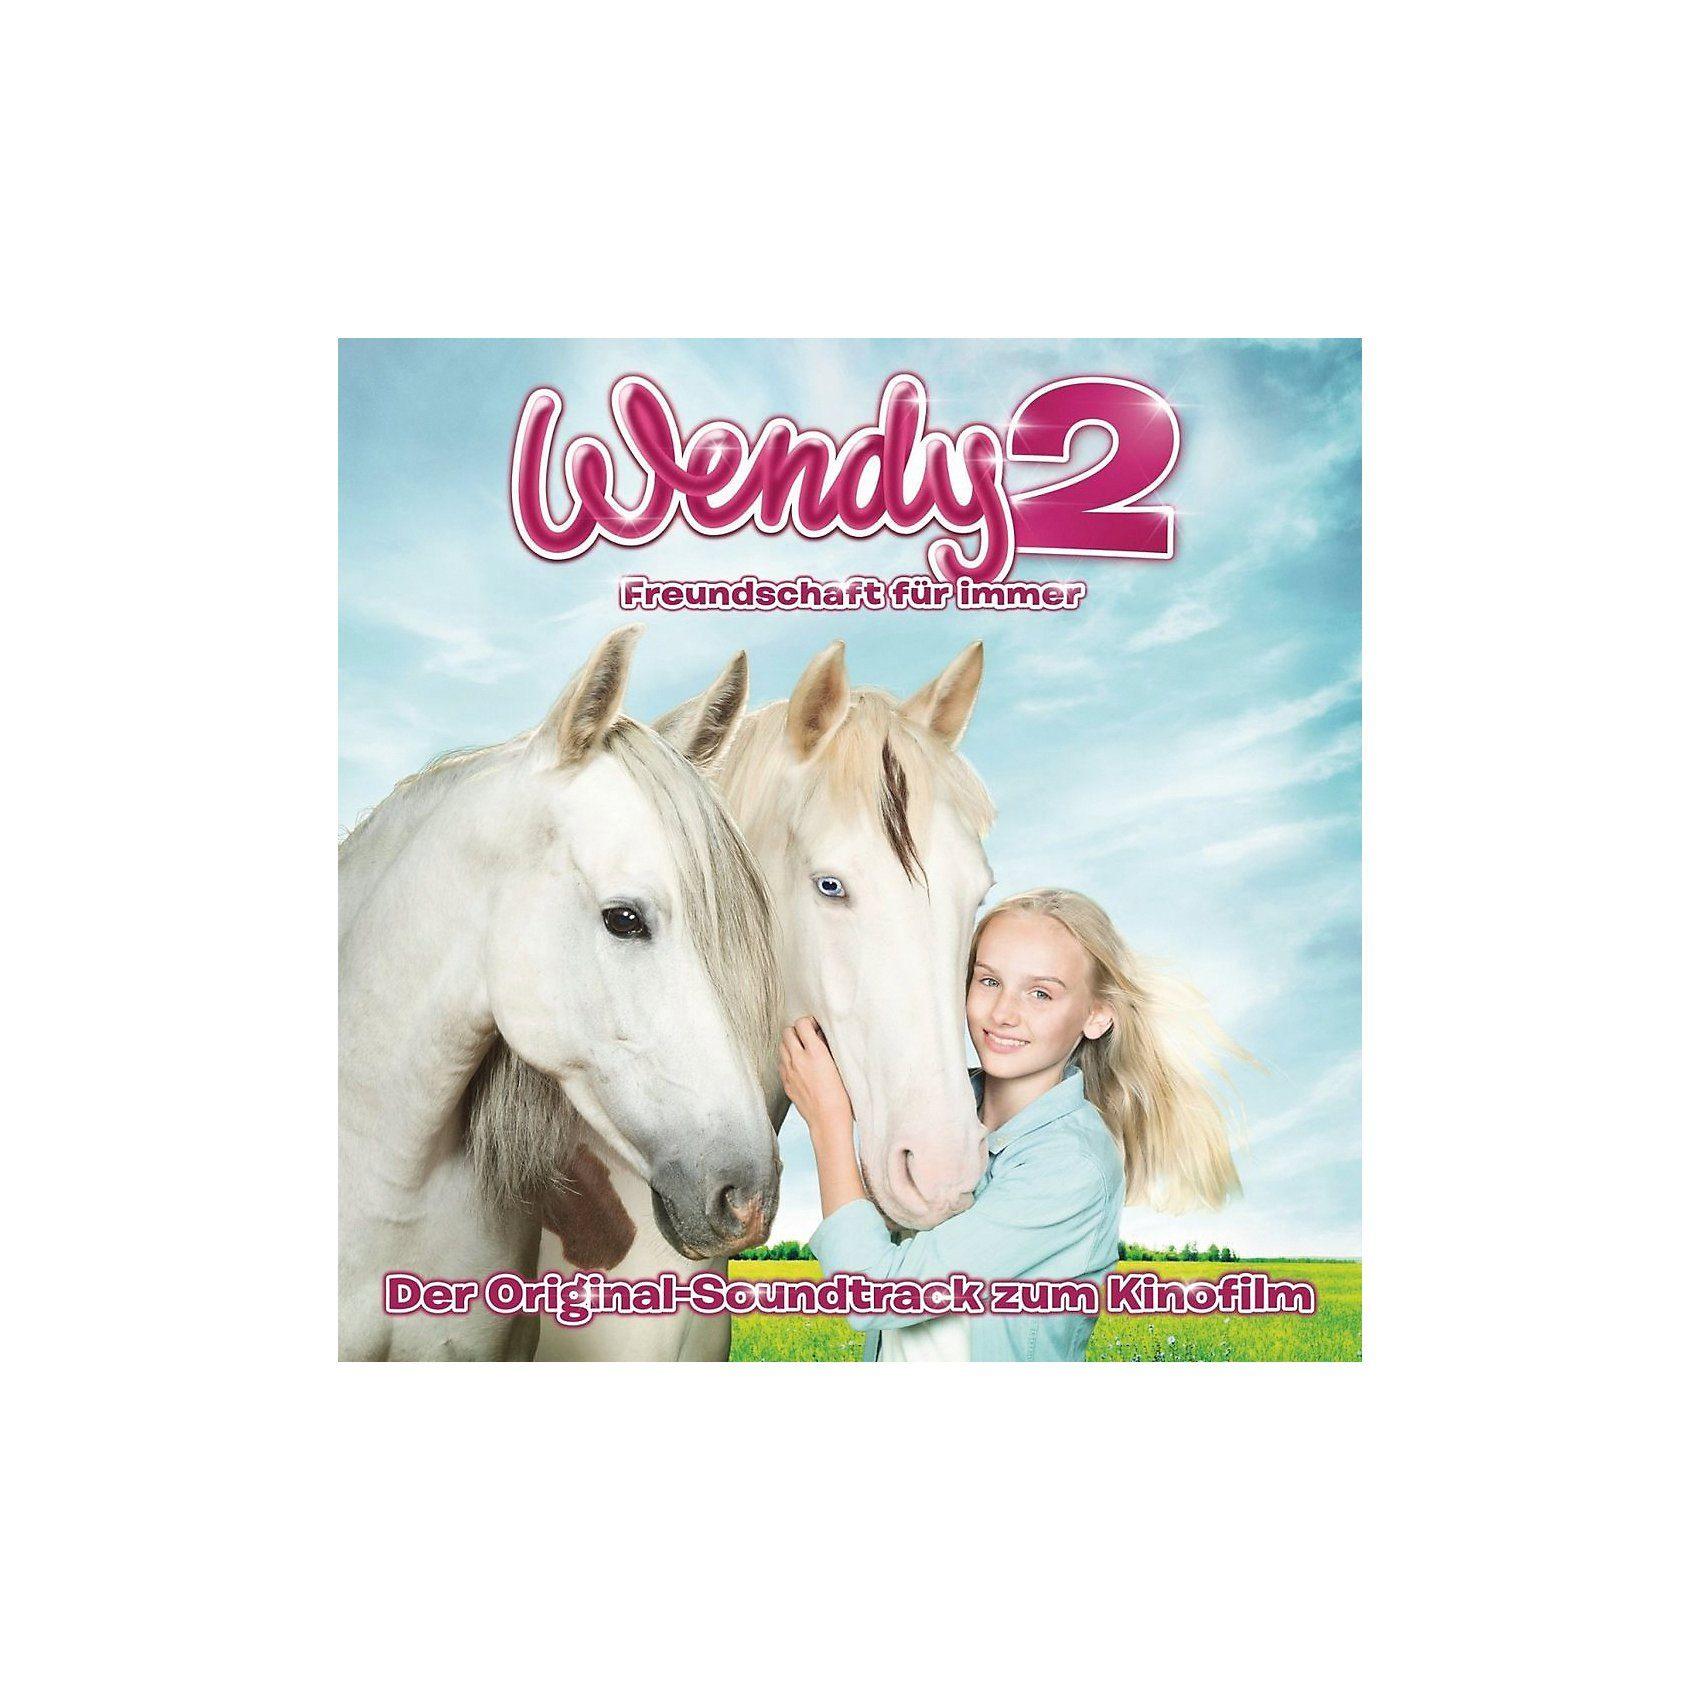 Sony CD Wendy 2 - Der Original-Soundtrack zum Kinofilm